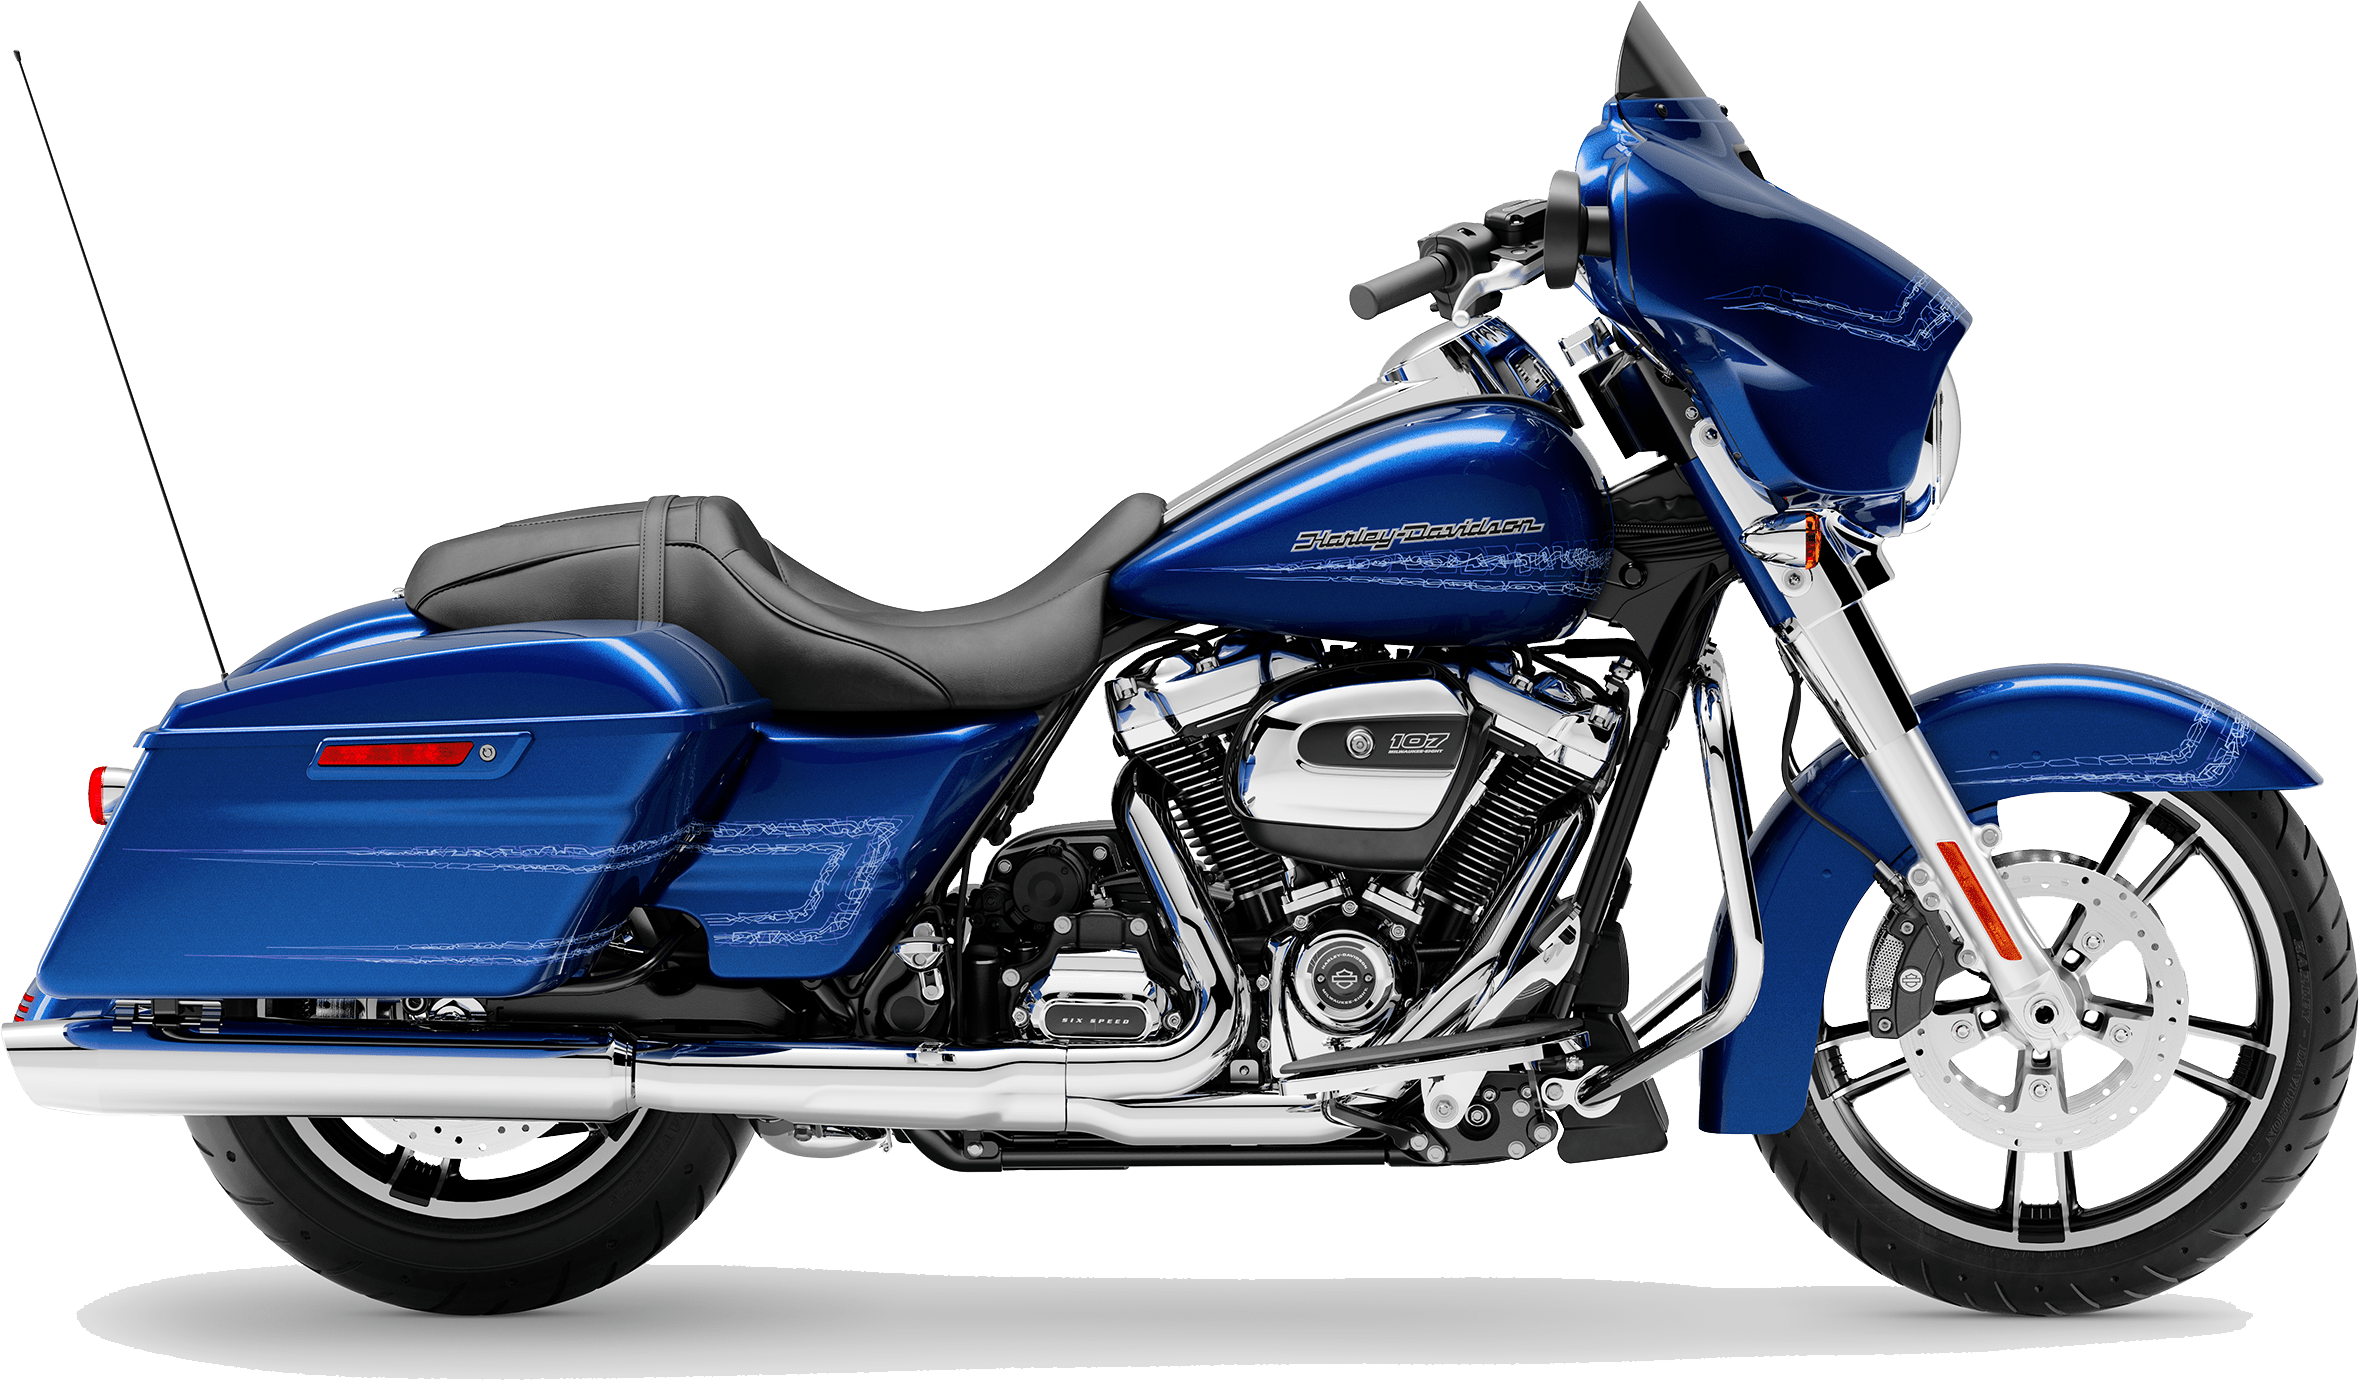 2019 Harley-Davidson H-D Touring Street Glide Blue Max